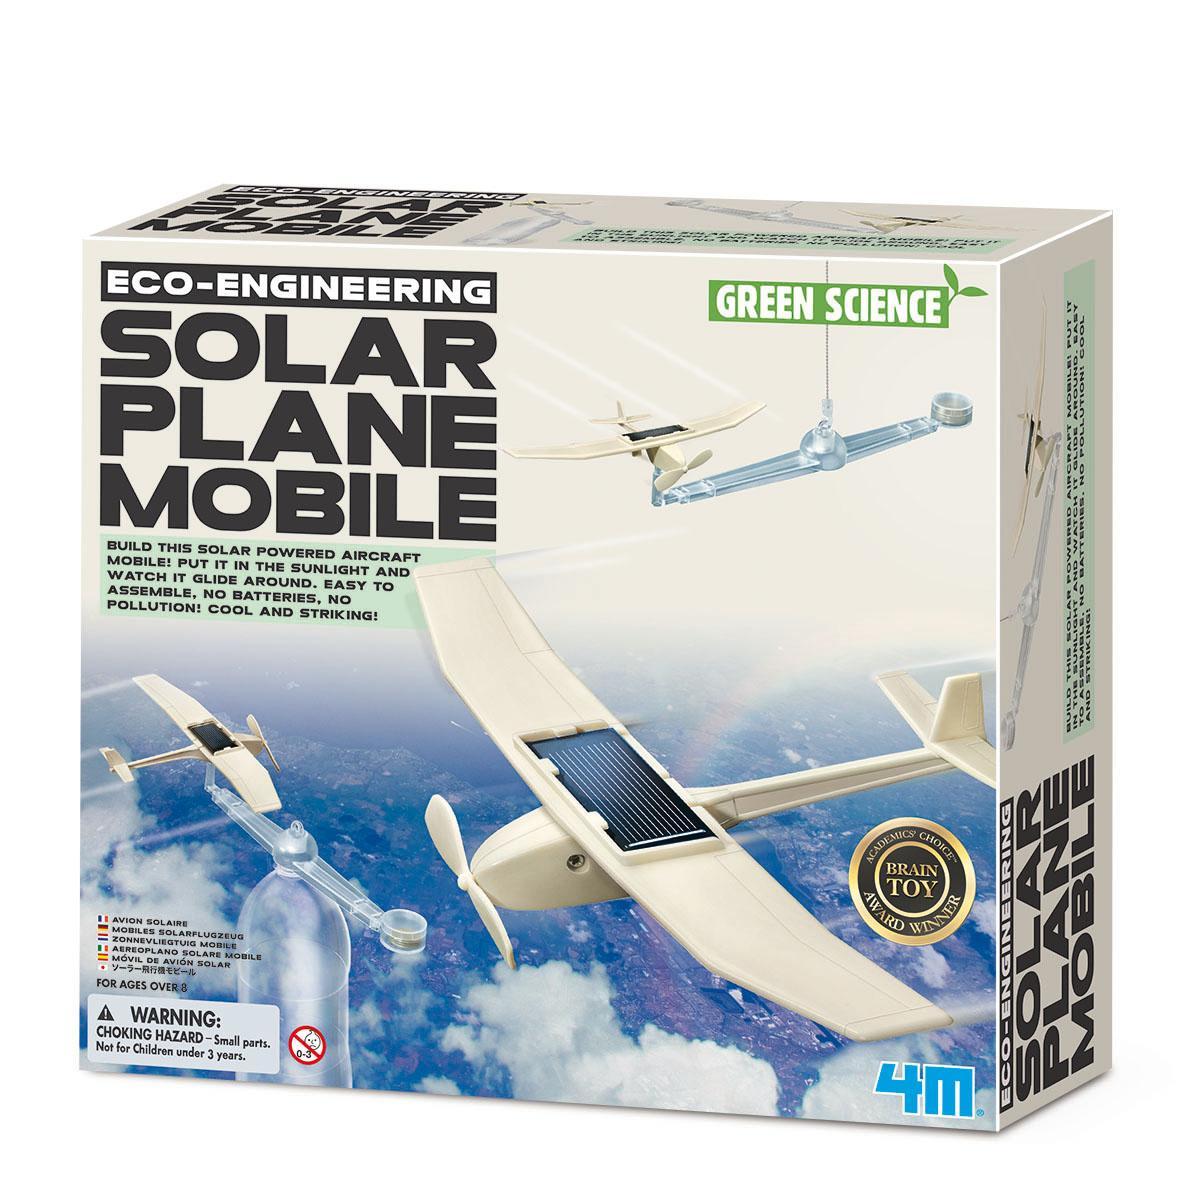 ECO EMGINEERING / SOLAR PLANE MOBILE  - GREEN SCIENCE